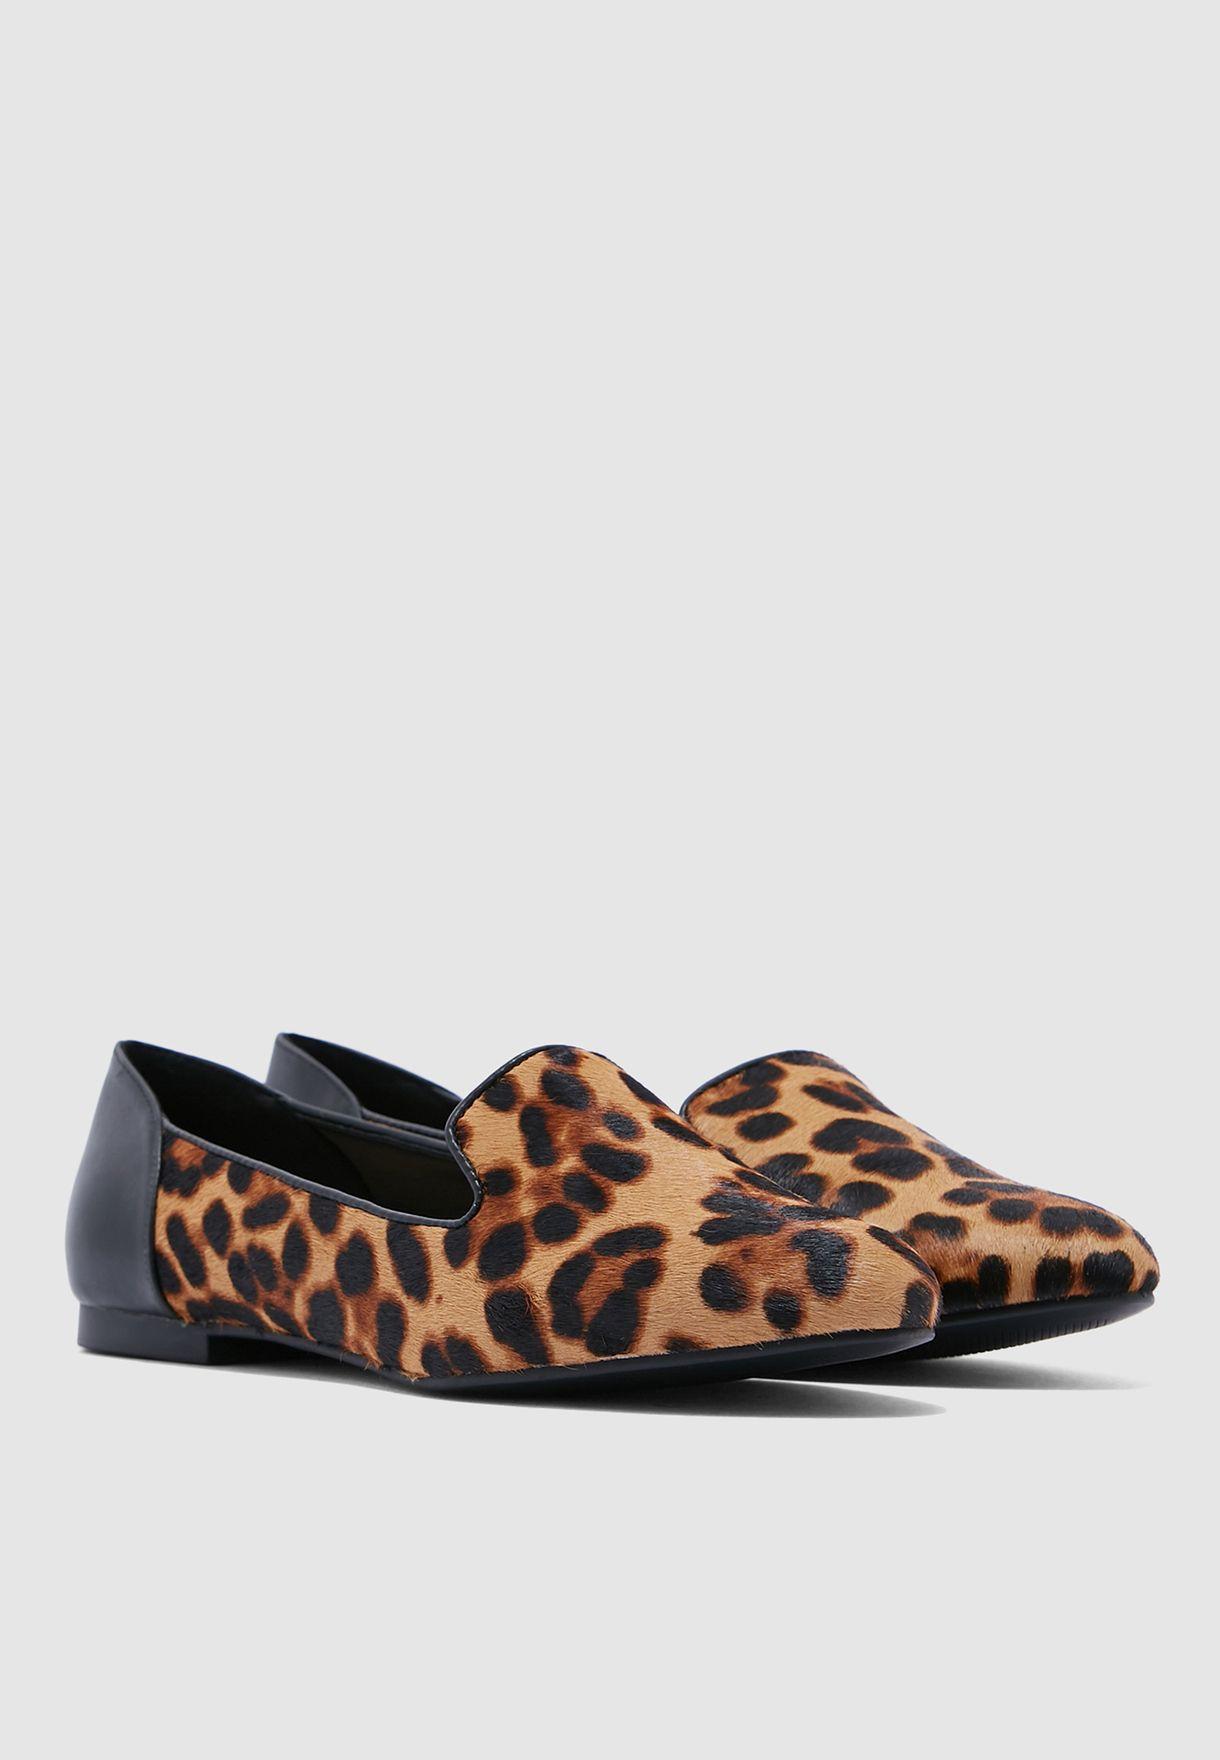 Kappa Flat Shoes